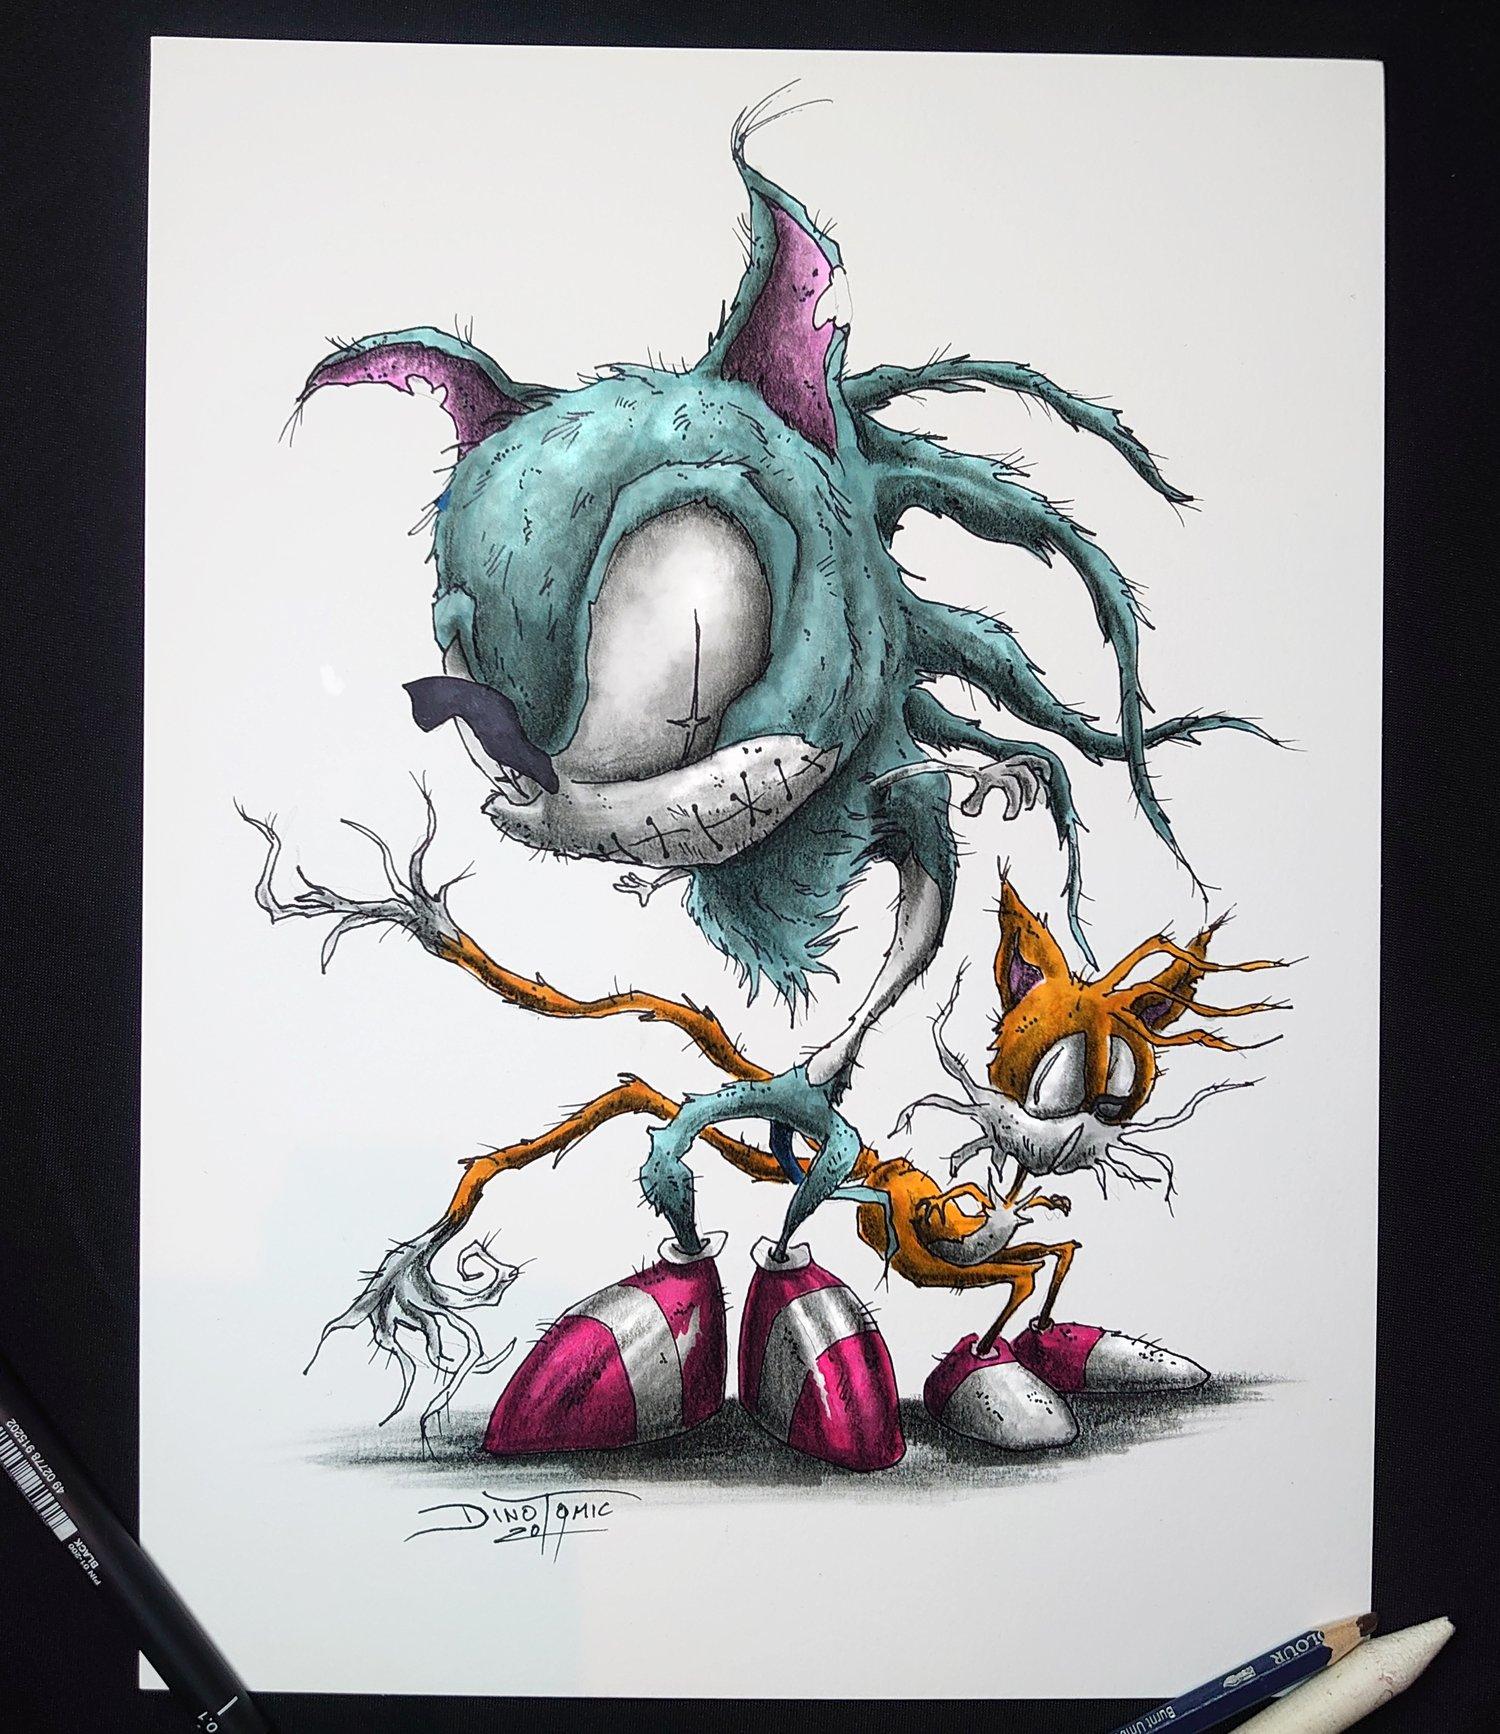 Image of #155 Sonic The Hedgehog Creepyfied